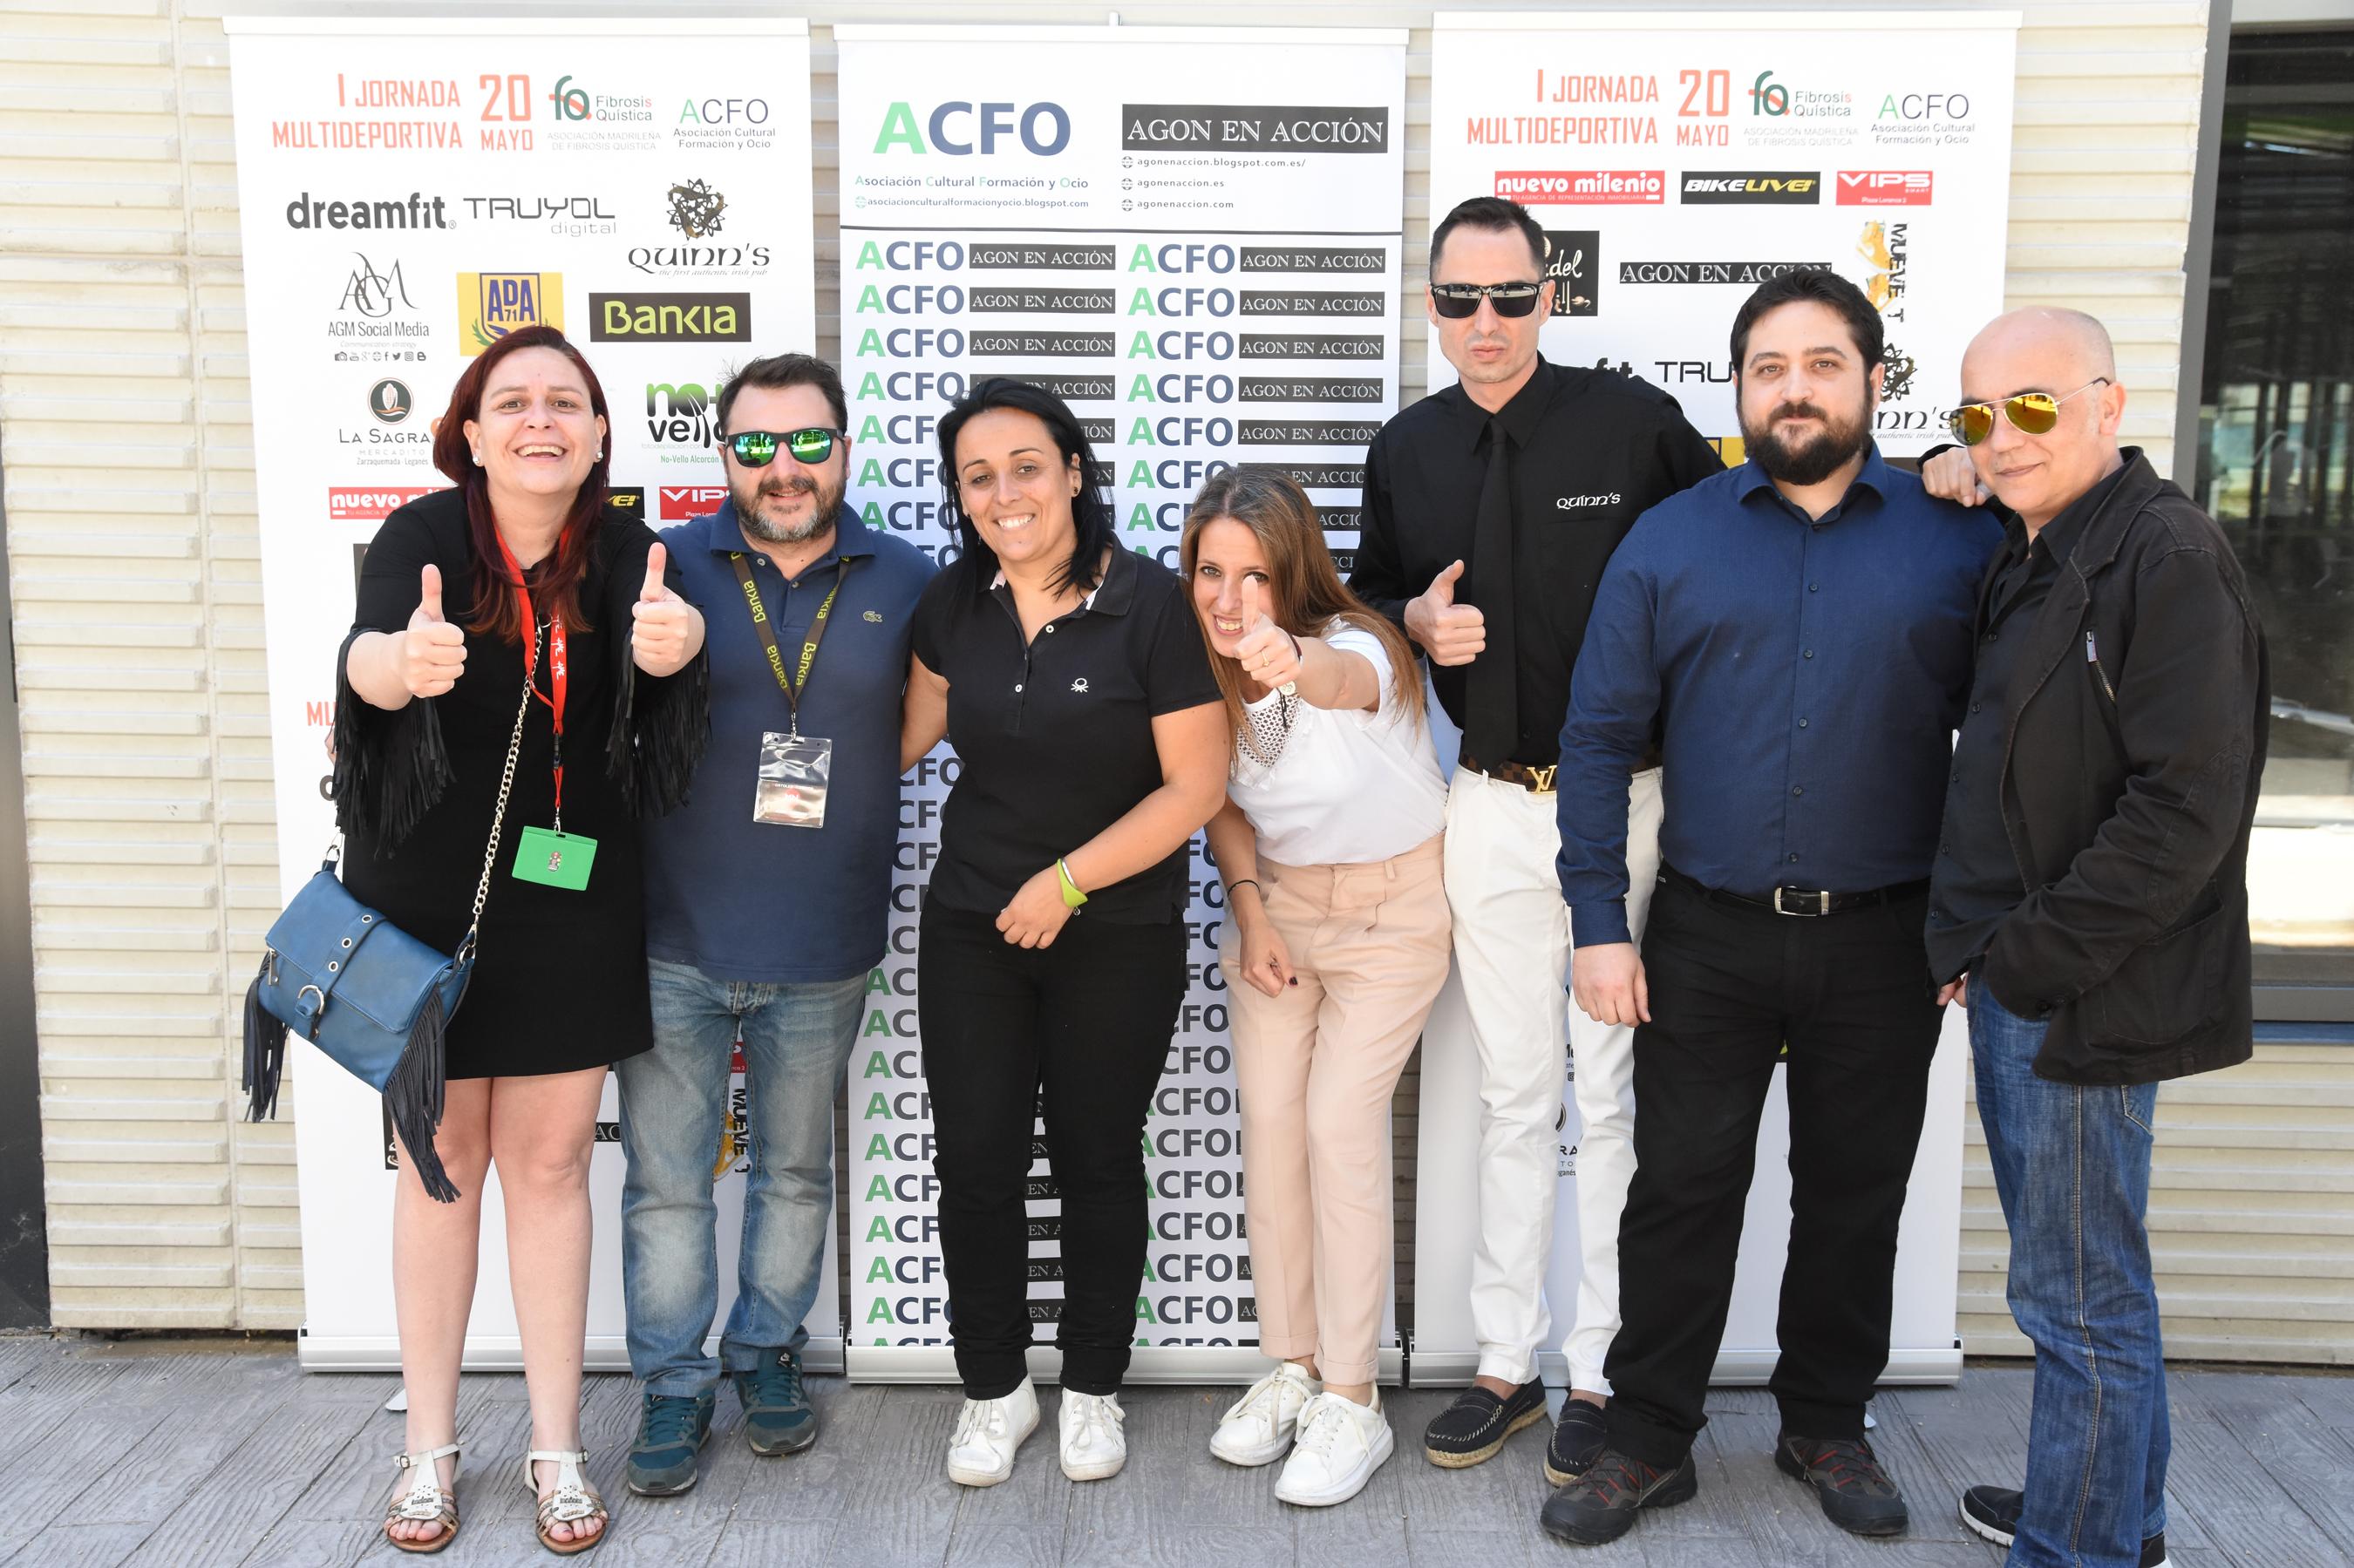 Reportaje de evento sobre fibrosis quística en Alcorcón